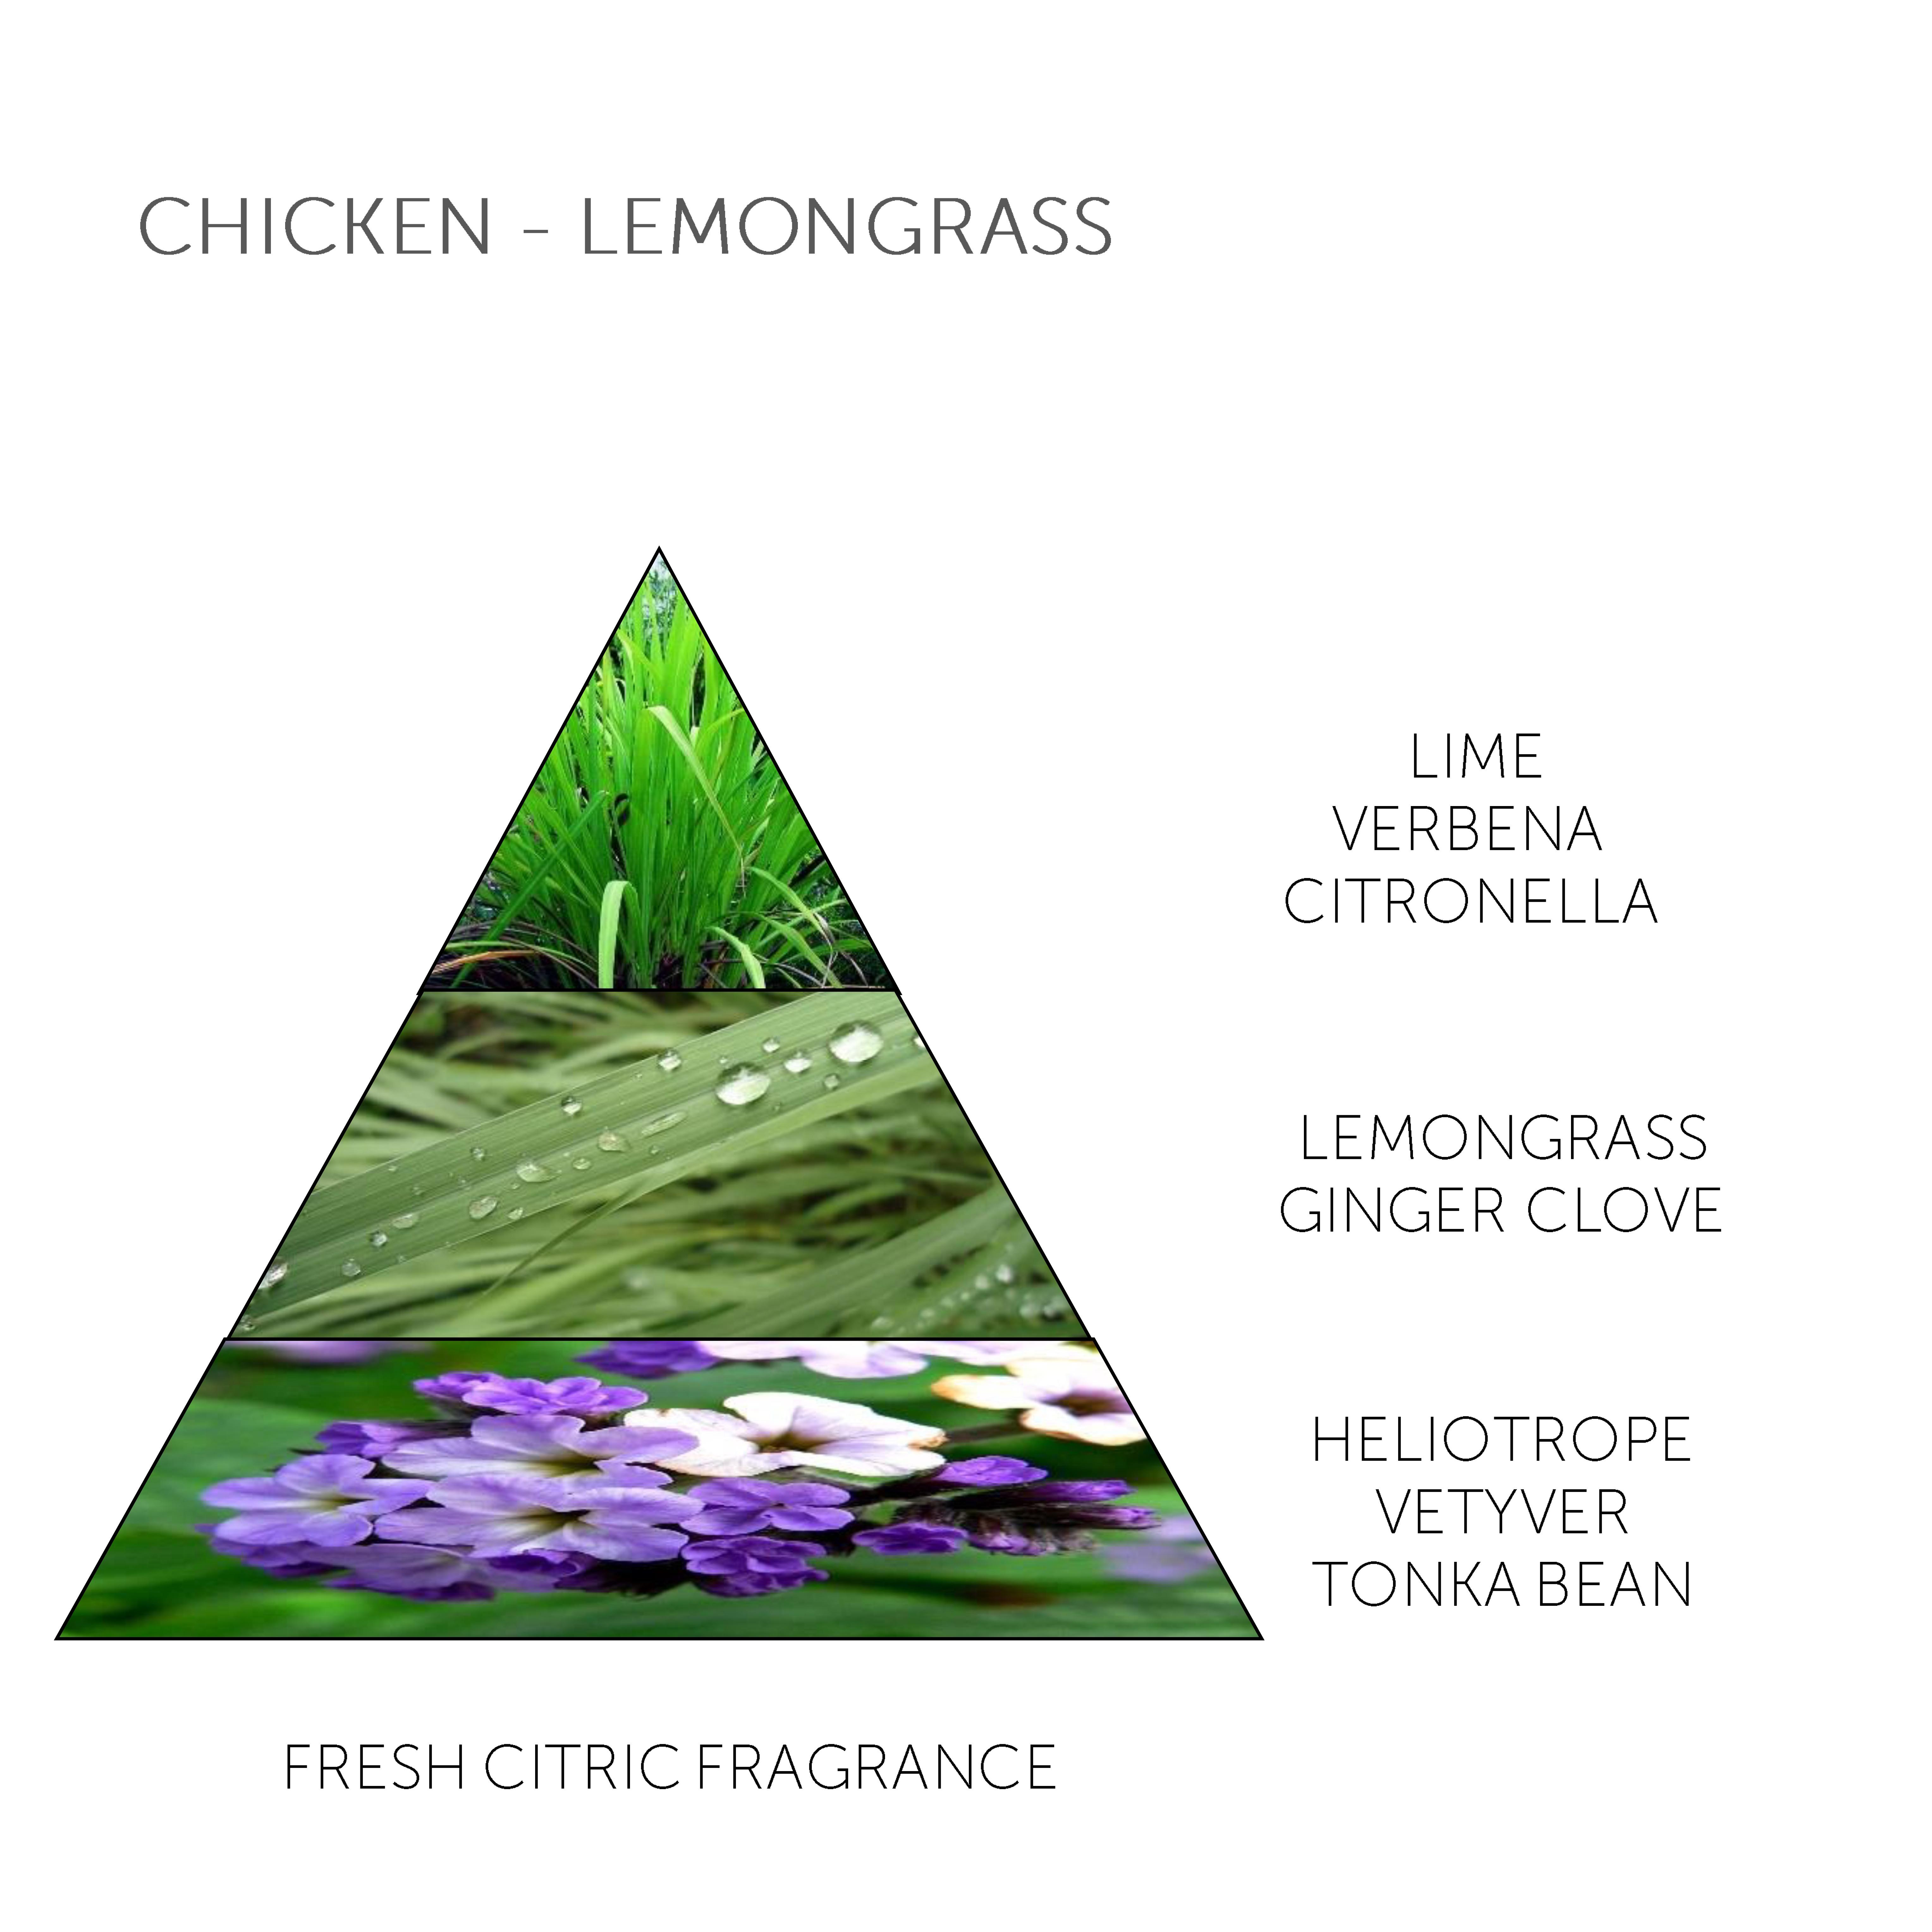 Mini Soap Bar Chicken - Lemongrass